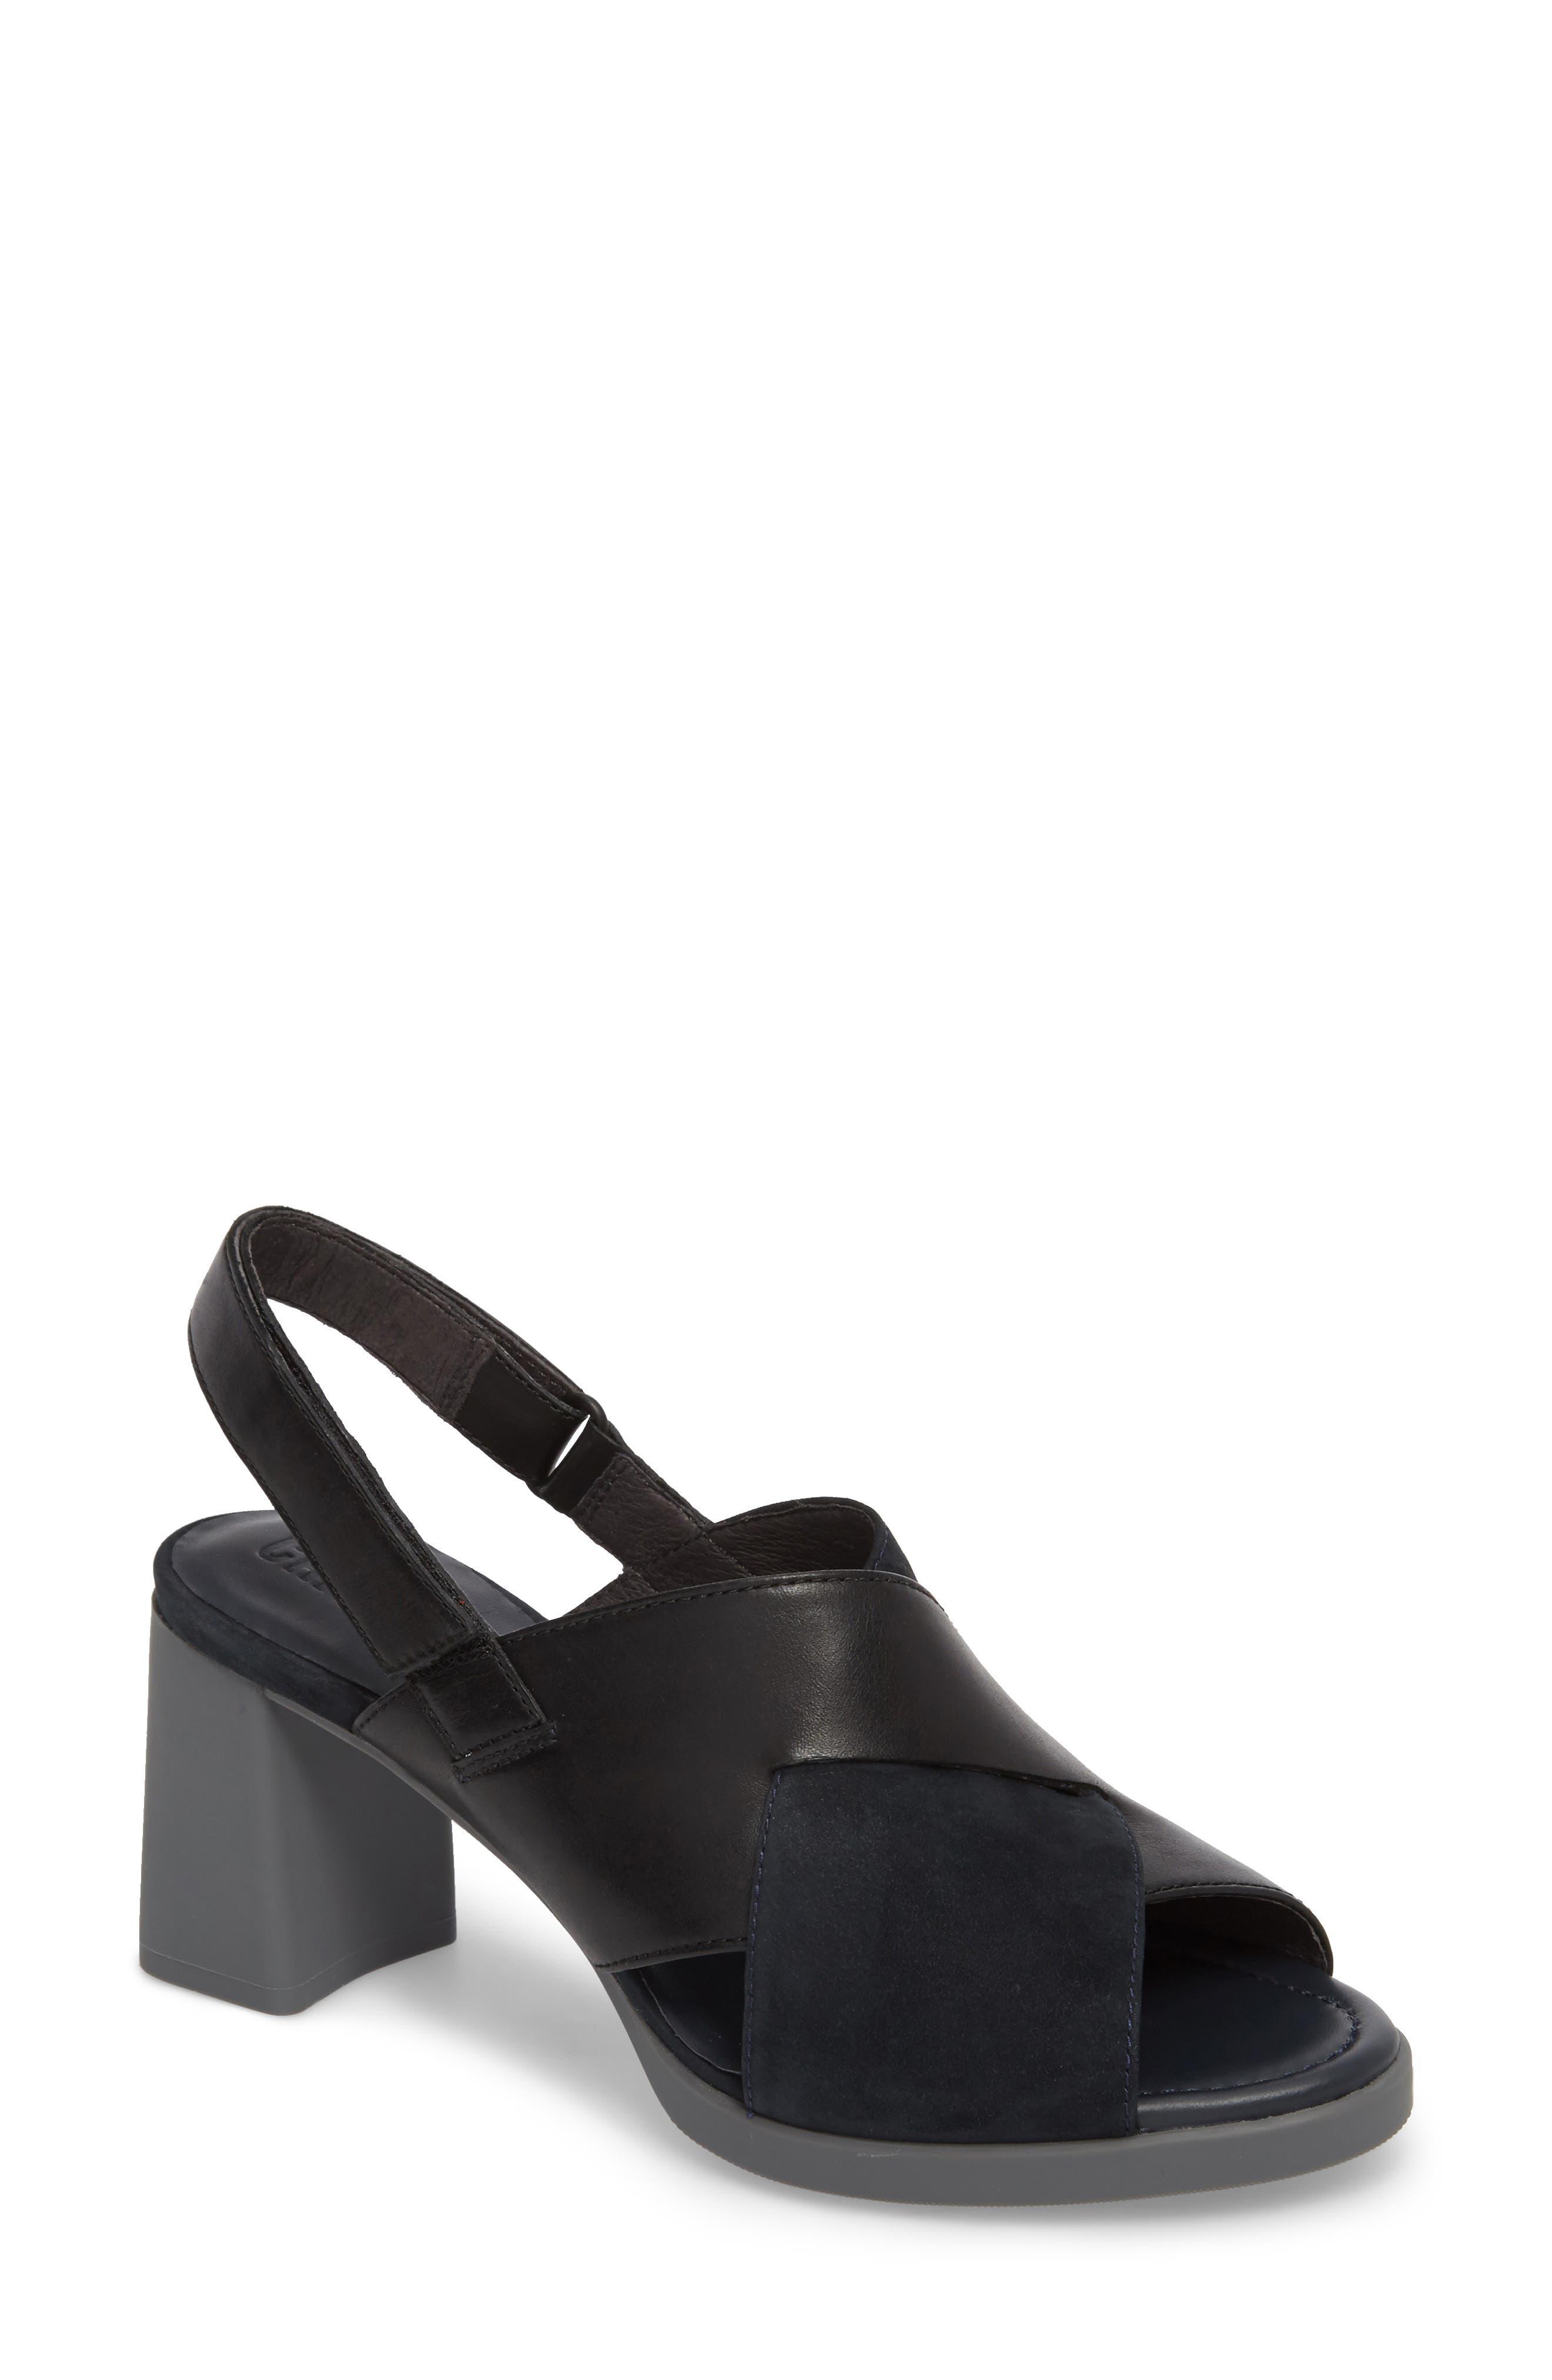 Alternate Image 1 Selected - Camper Kara Cross Strap Sandal (Women)